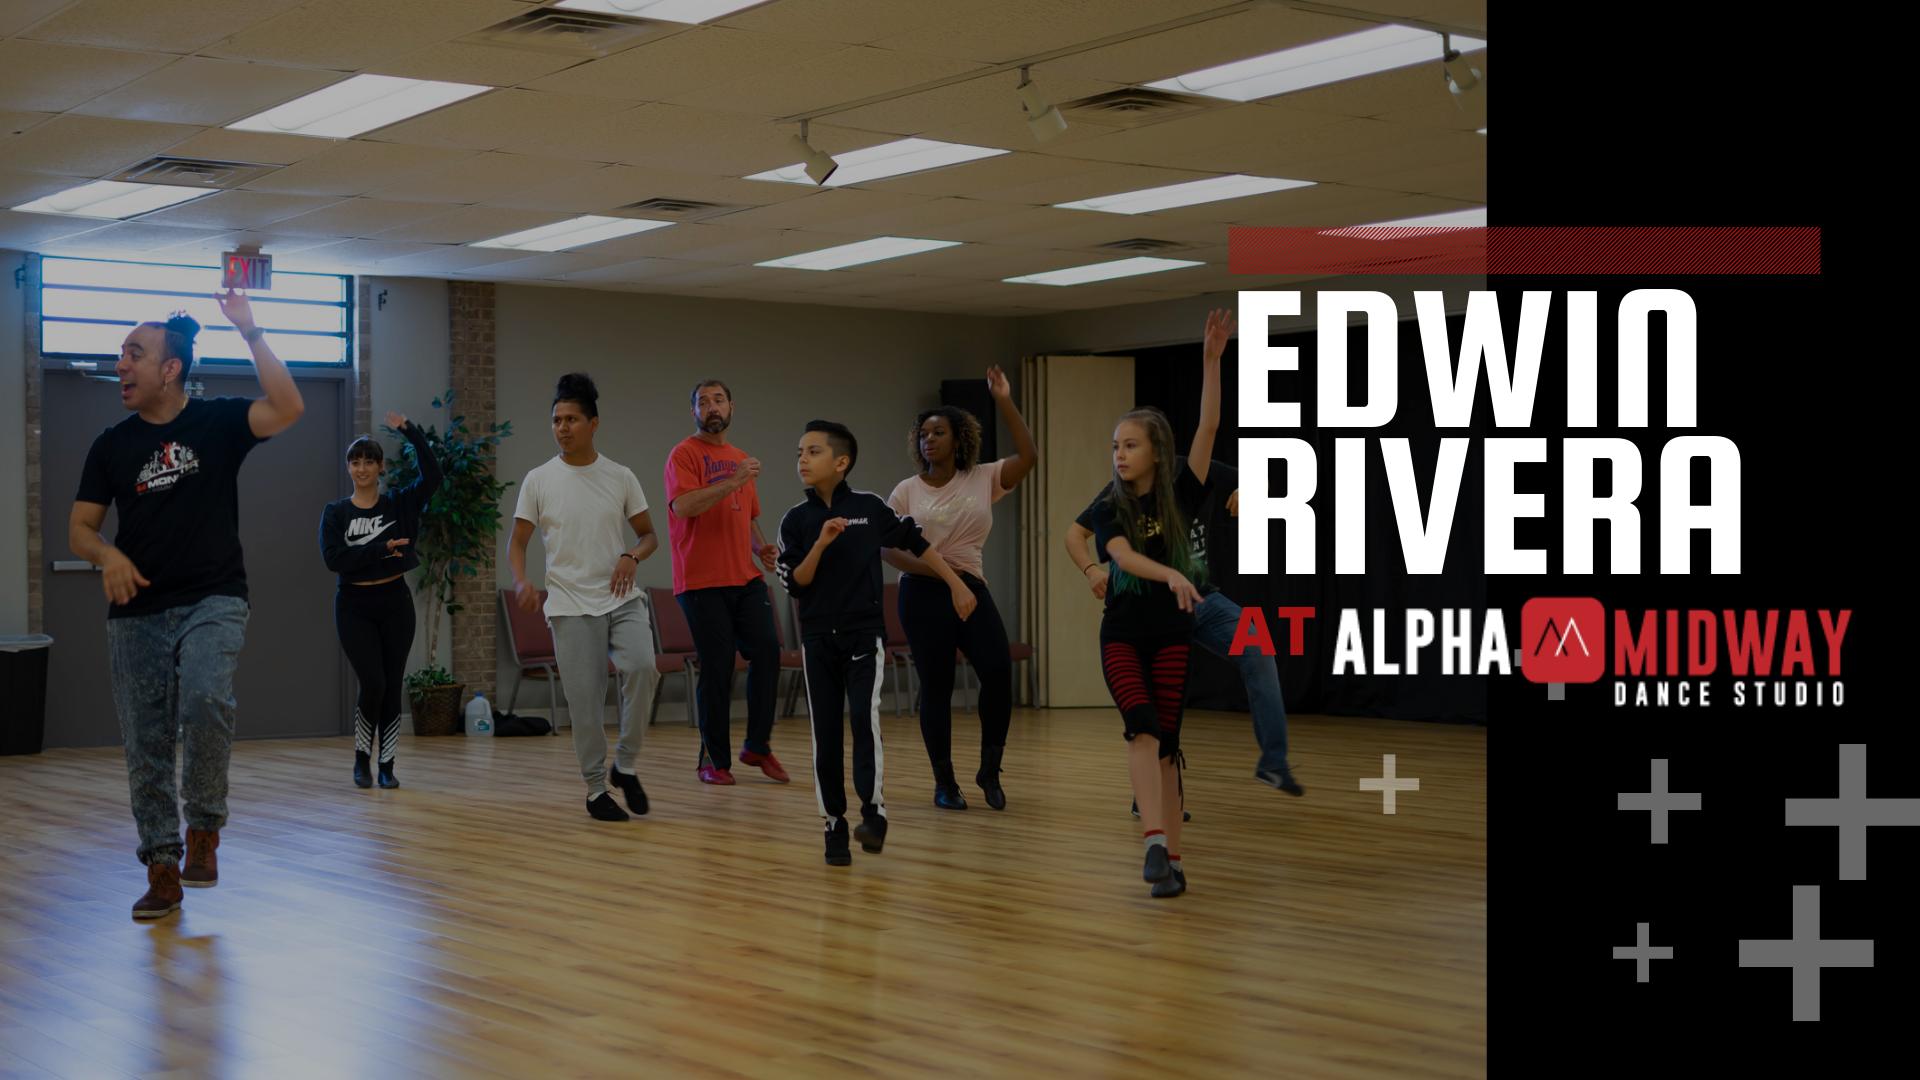 Edwin Rivera at Alpha Midway